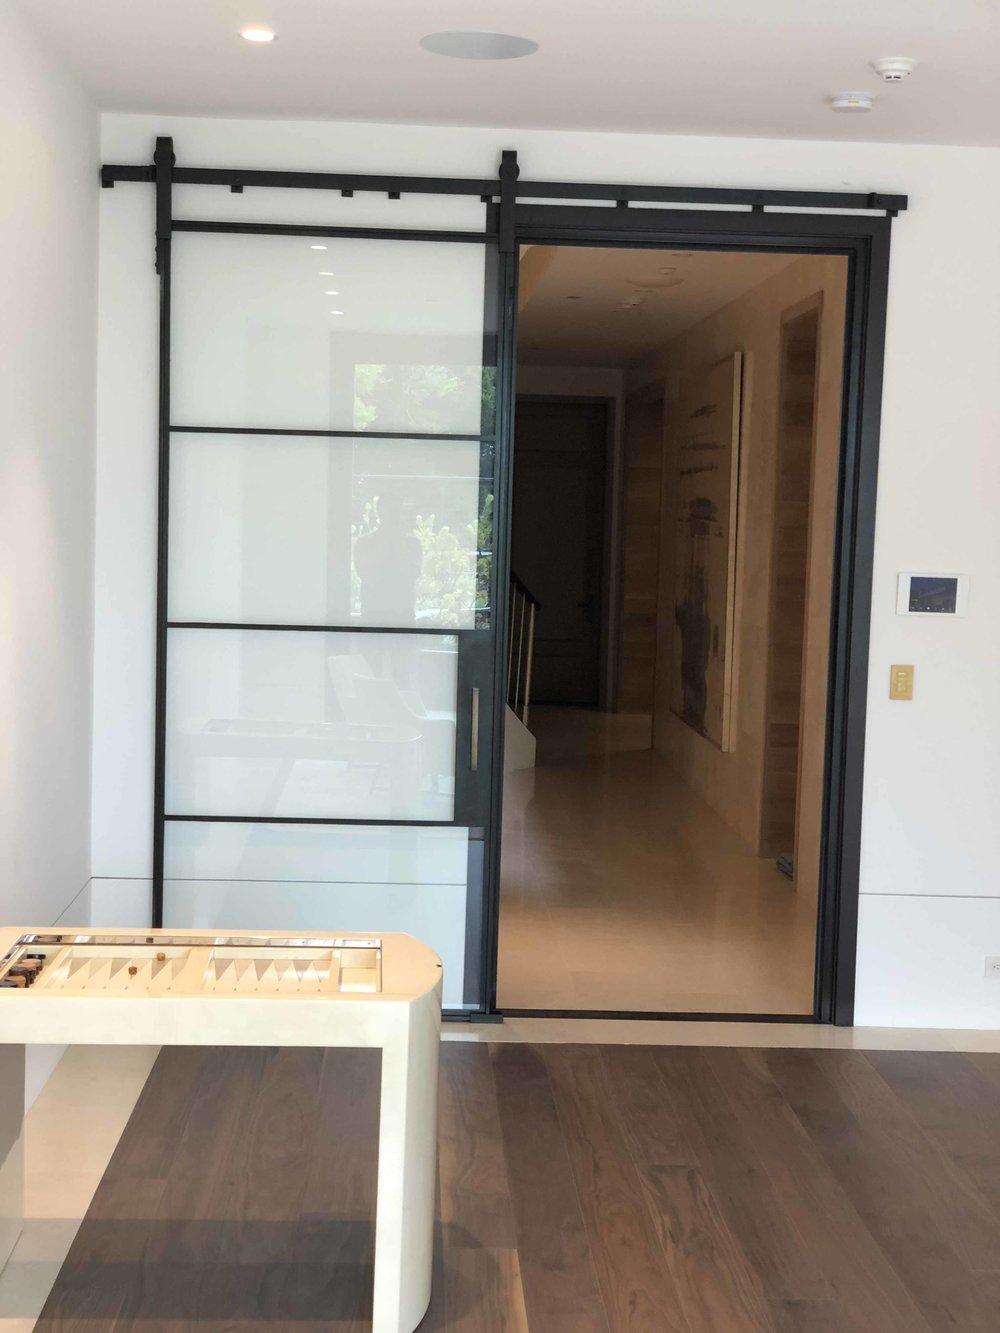 Steel Siding Door with Black Patina